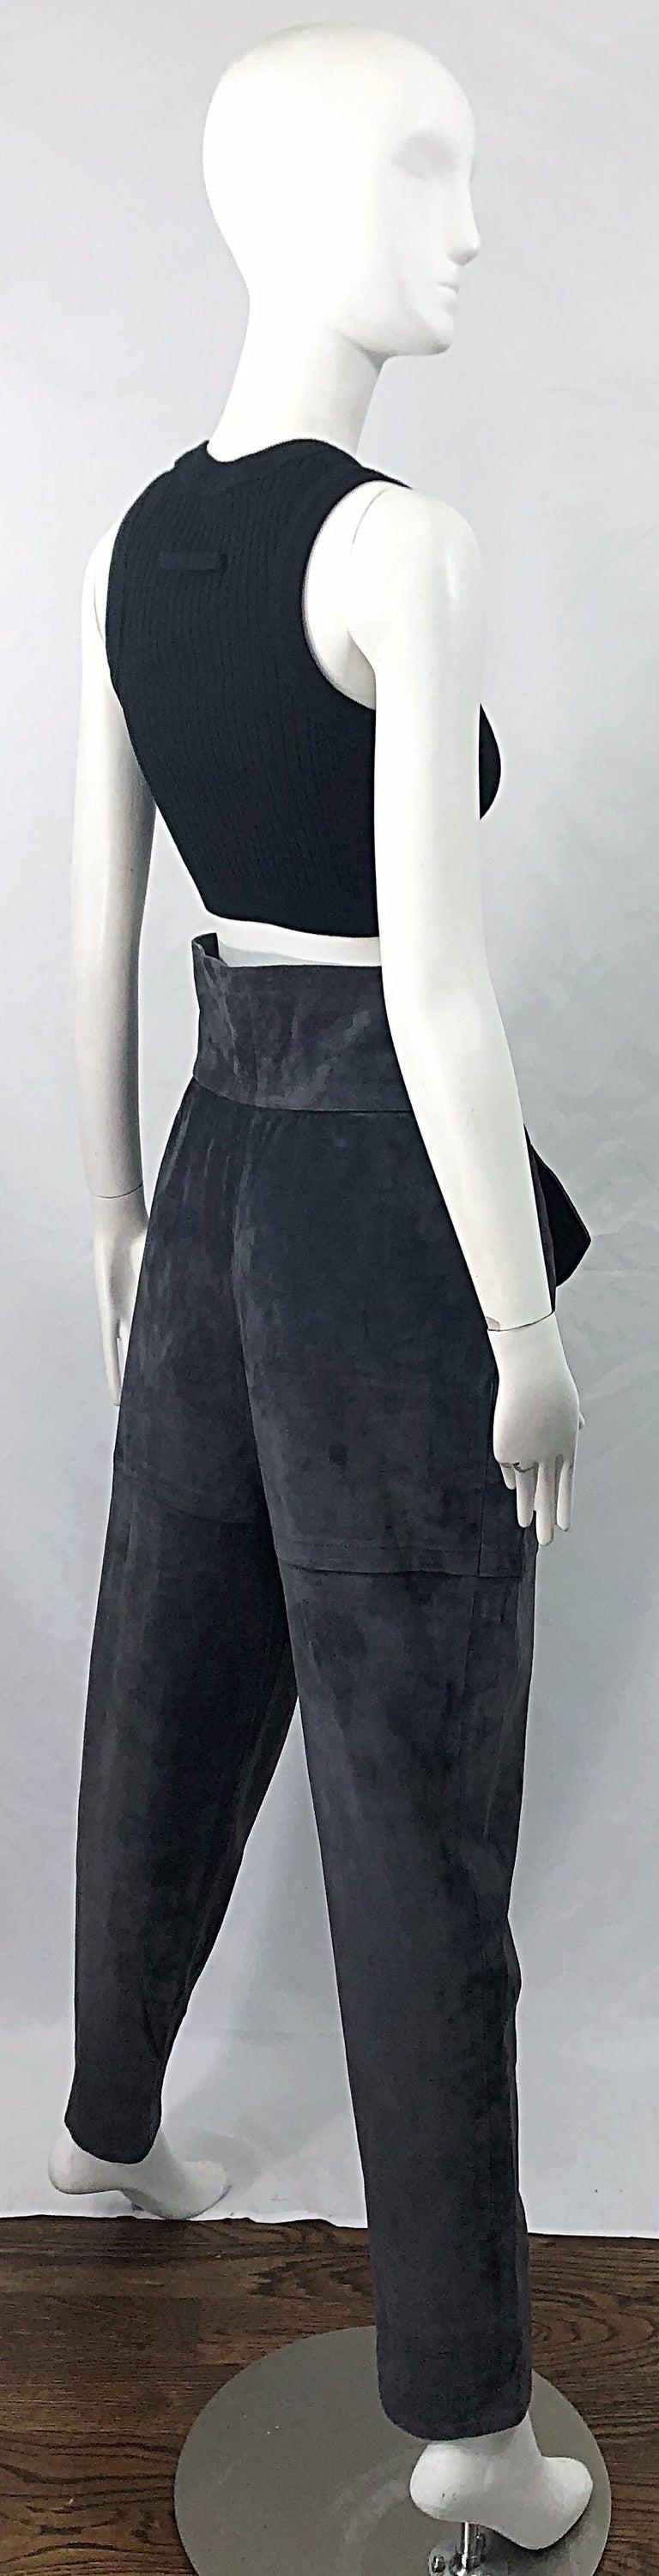 Vintage Yves Saint Laurent YSL 1980s Grey Suede Leather High Waisted Harem Pants For Sale 11